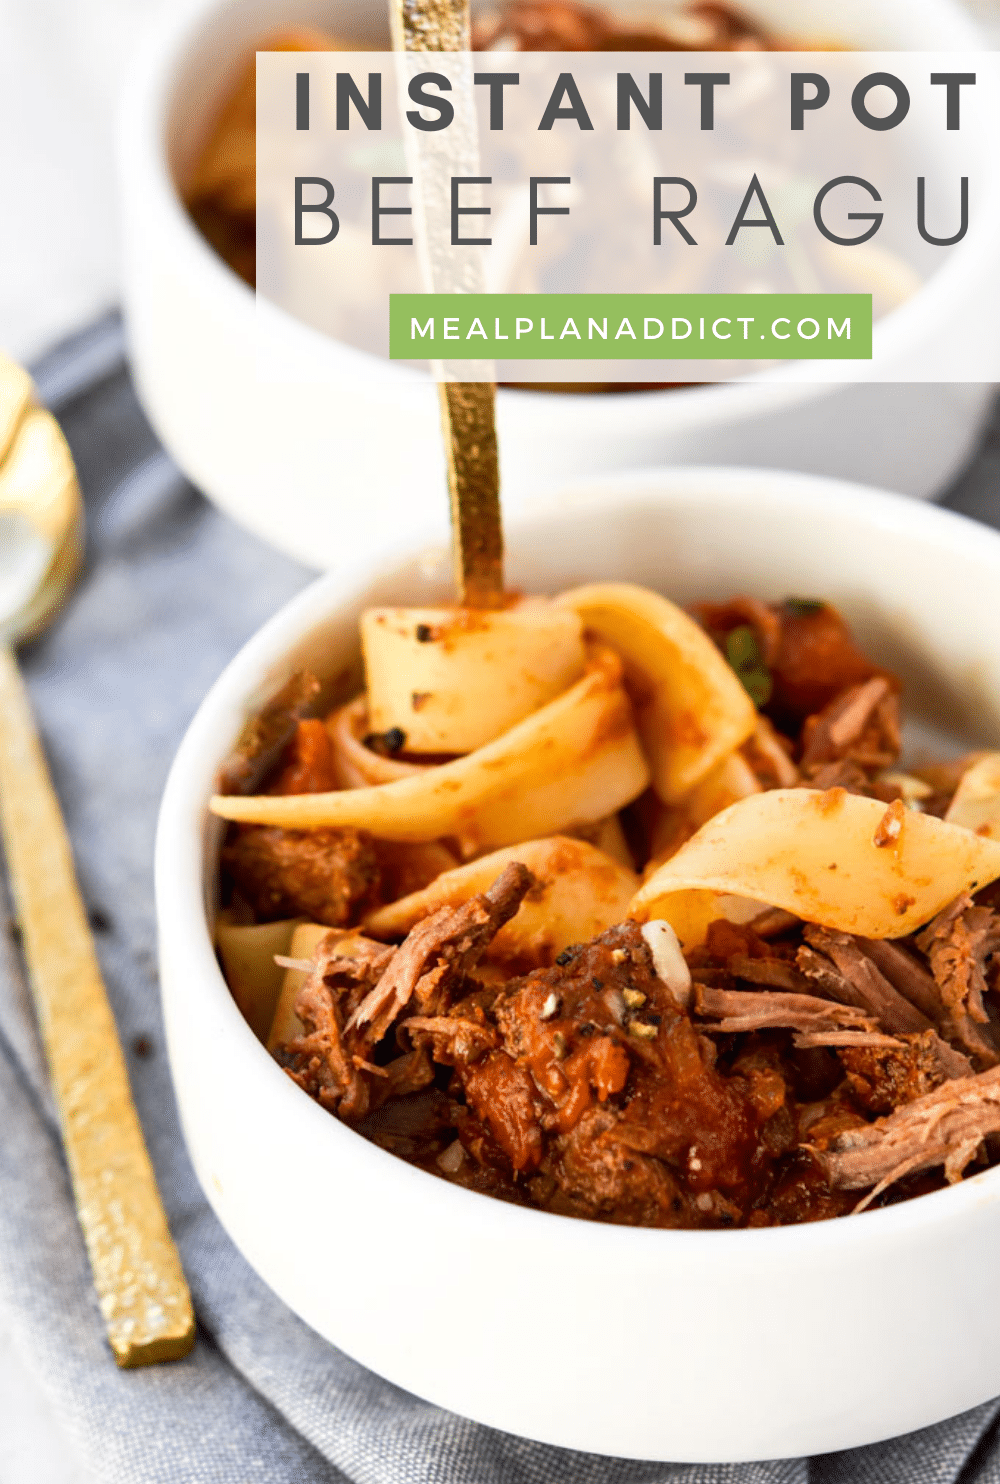 45 Minute Instant Pot Beef Ragu   Meal Plan Addict